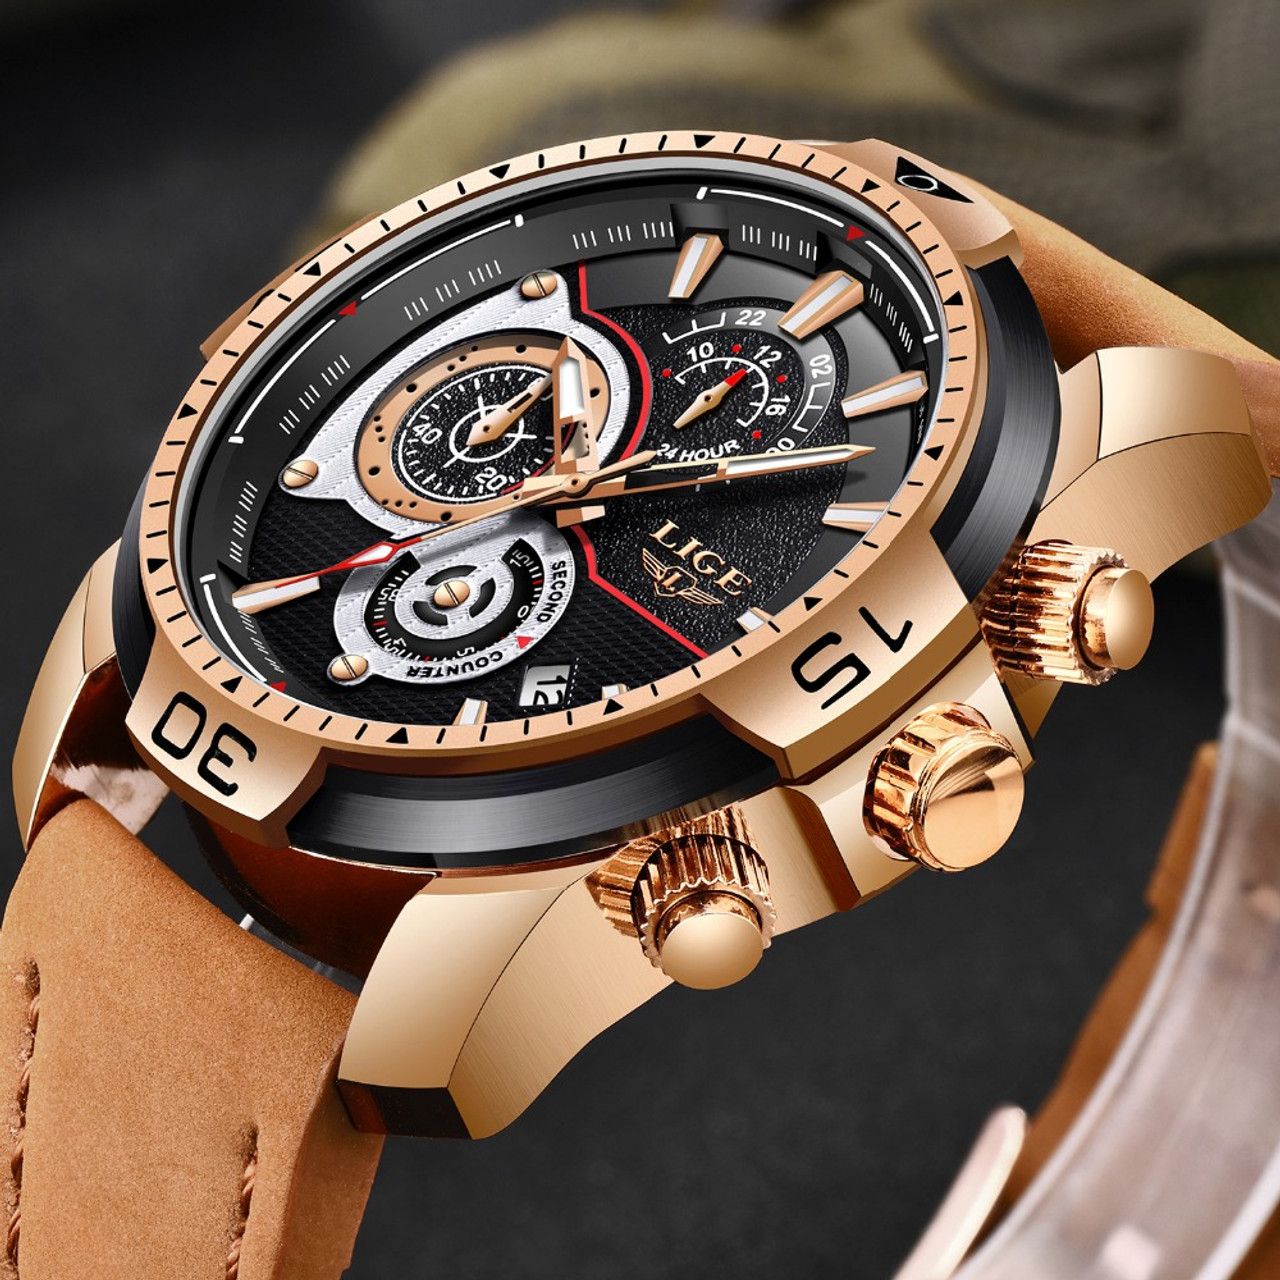 Mens Watches Waterproof Top Brand Luxury Quartz Watch Men Sport Watch Fashion Casual Military Clock Male Relogio Masculino Gifts Men's Watches